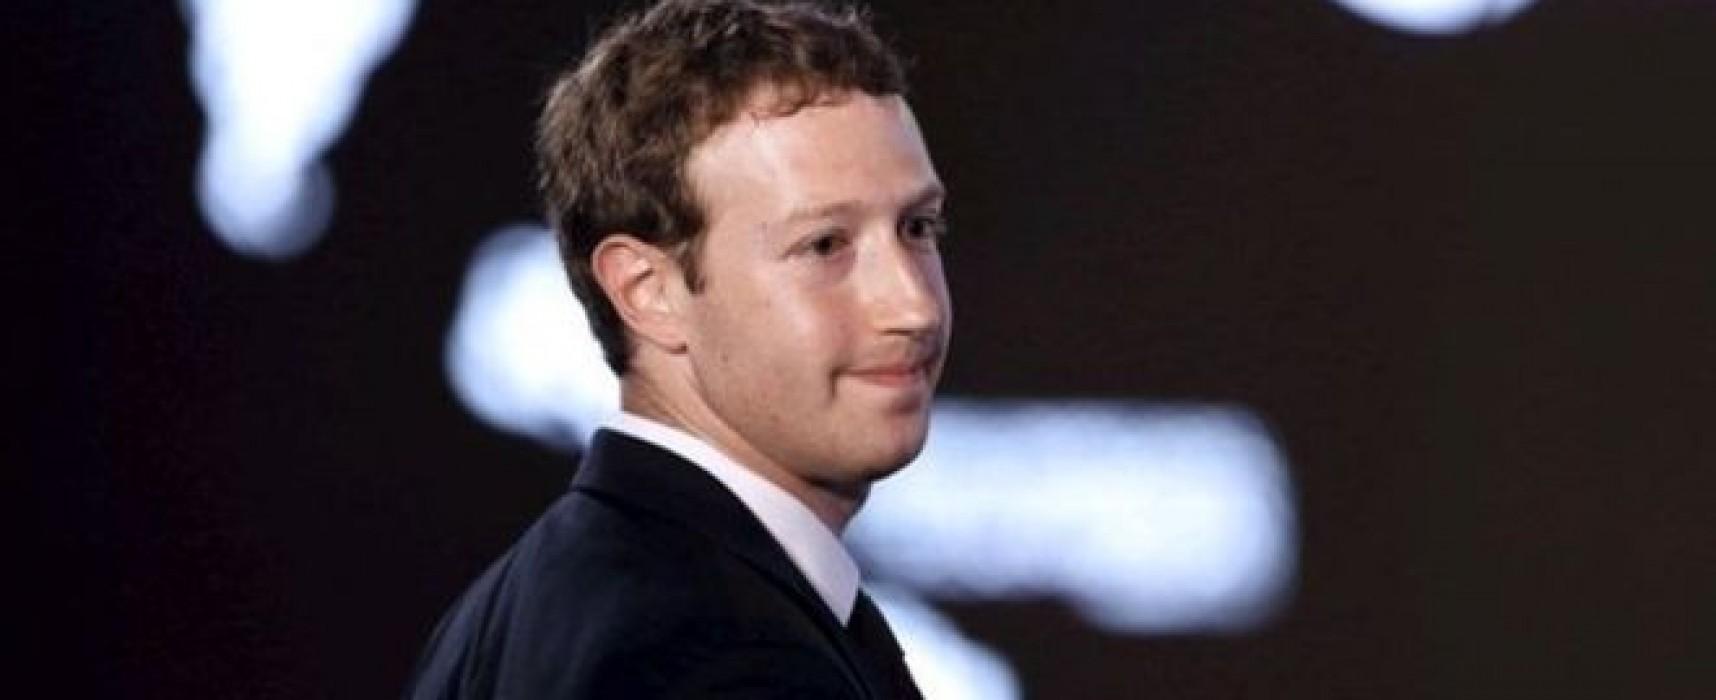 Ukrainians petition Facebook against 'Russian trolls'